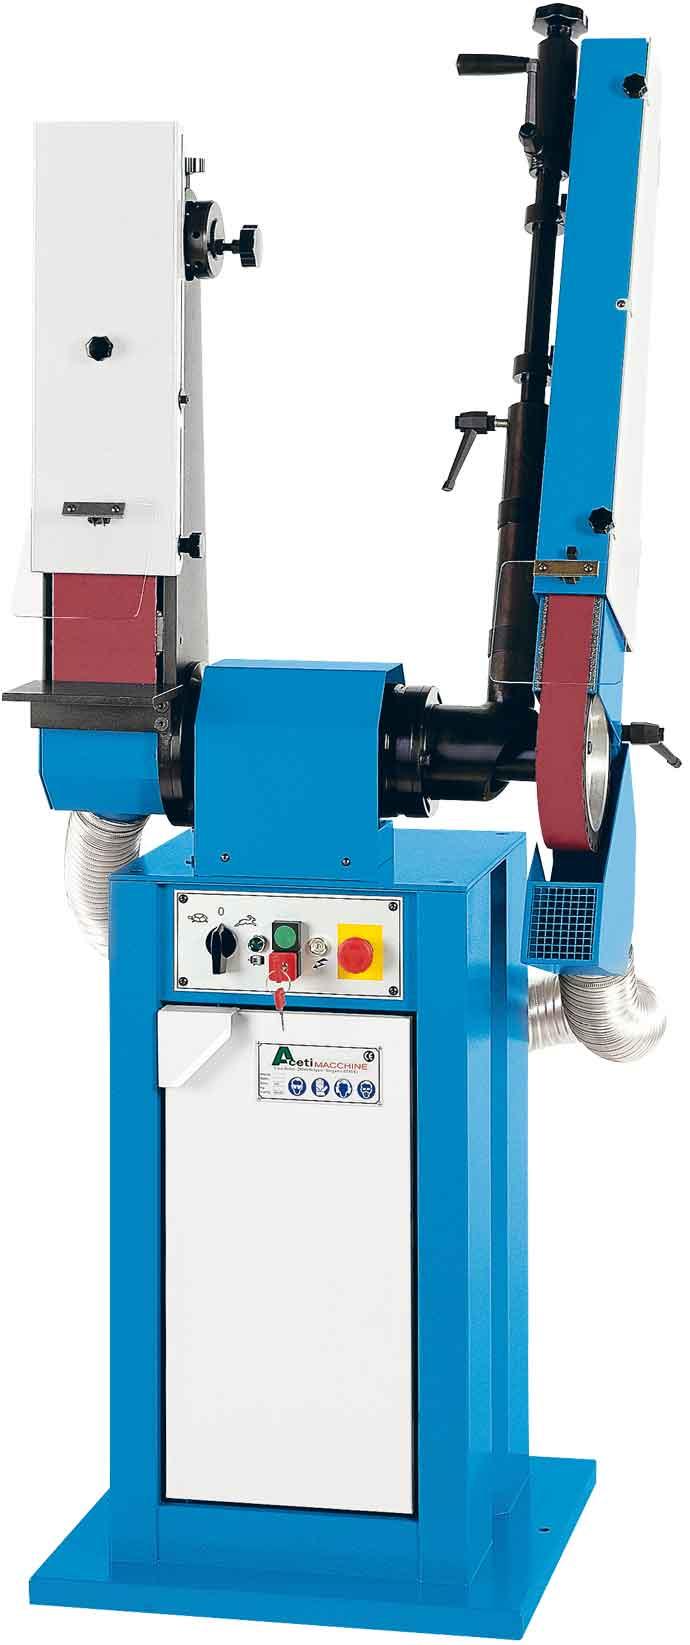 ART.31 - Belt grinding machine